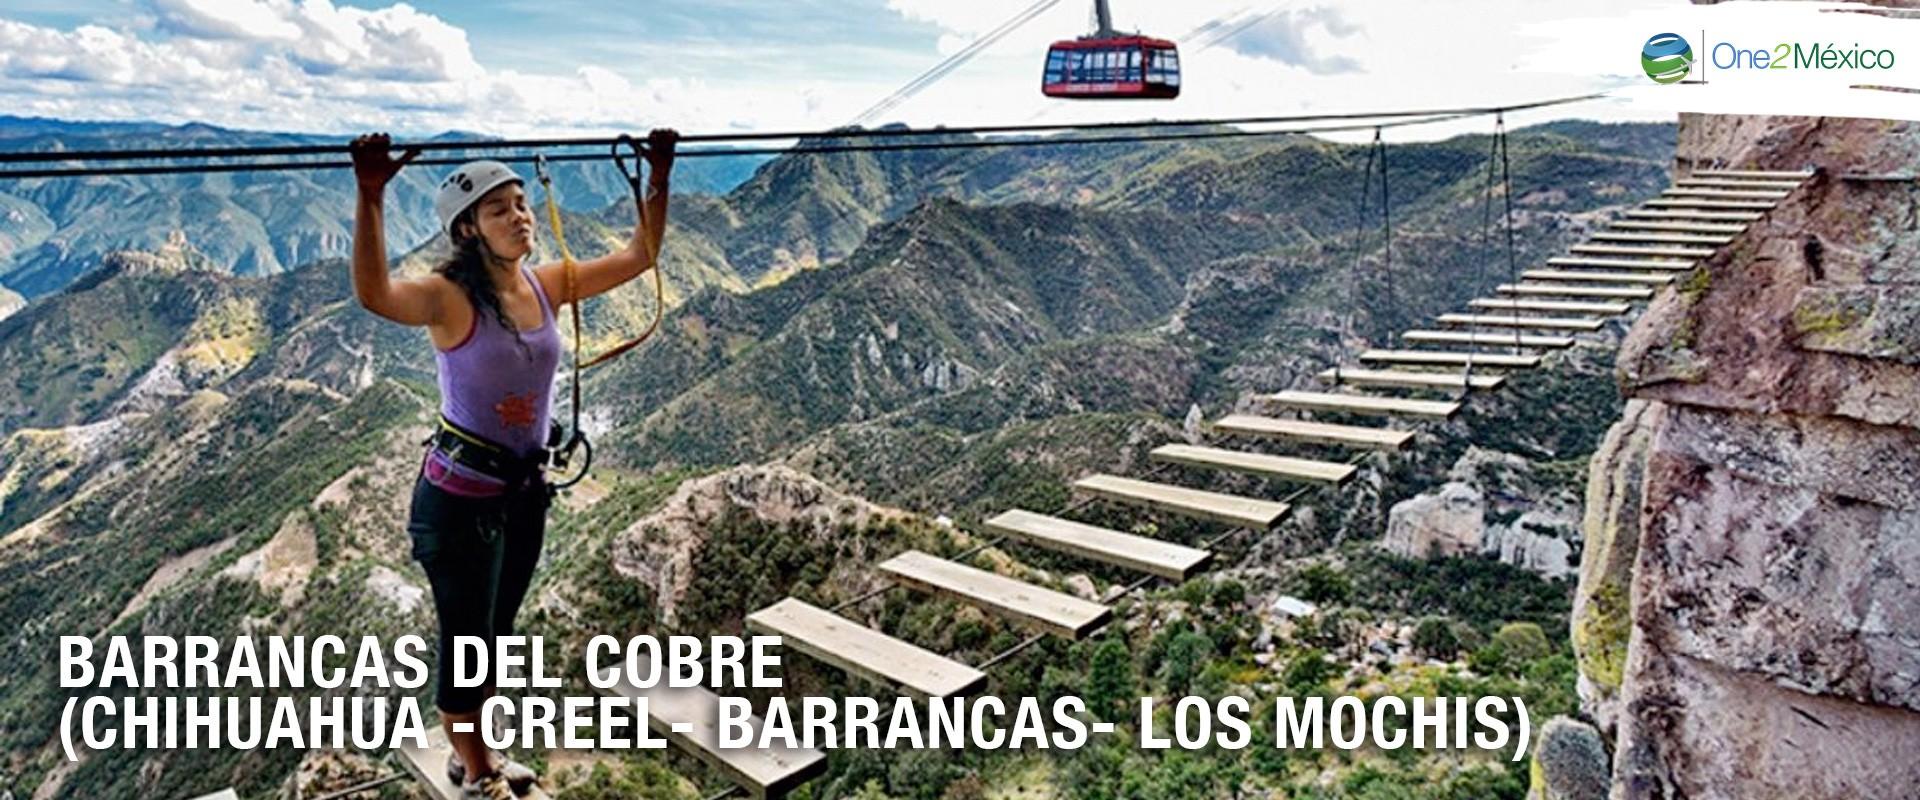 Barrancas del Cobre (Chihuahua -Creel- Barrancas- Los Mochis).